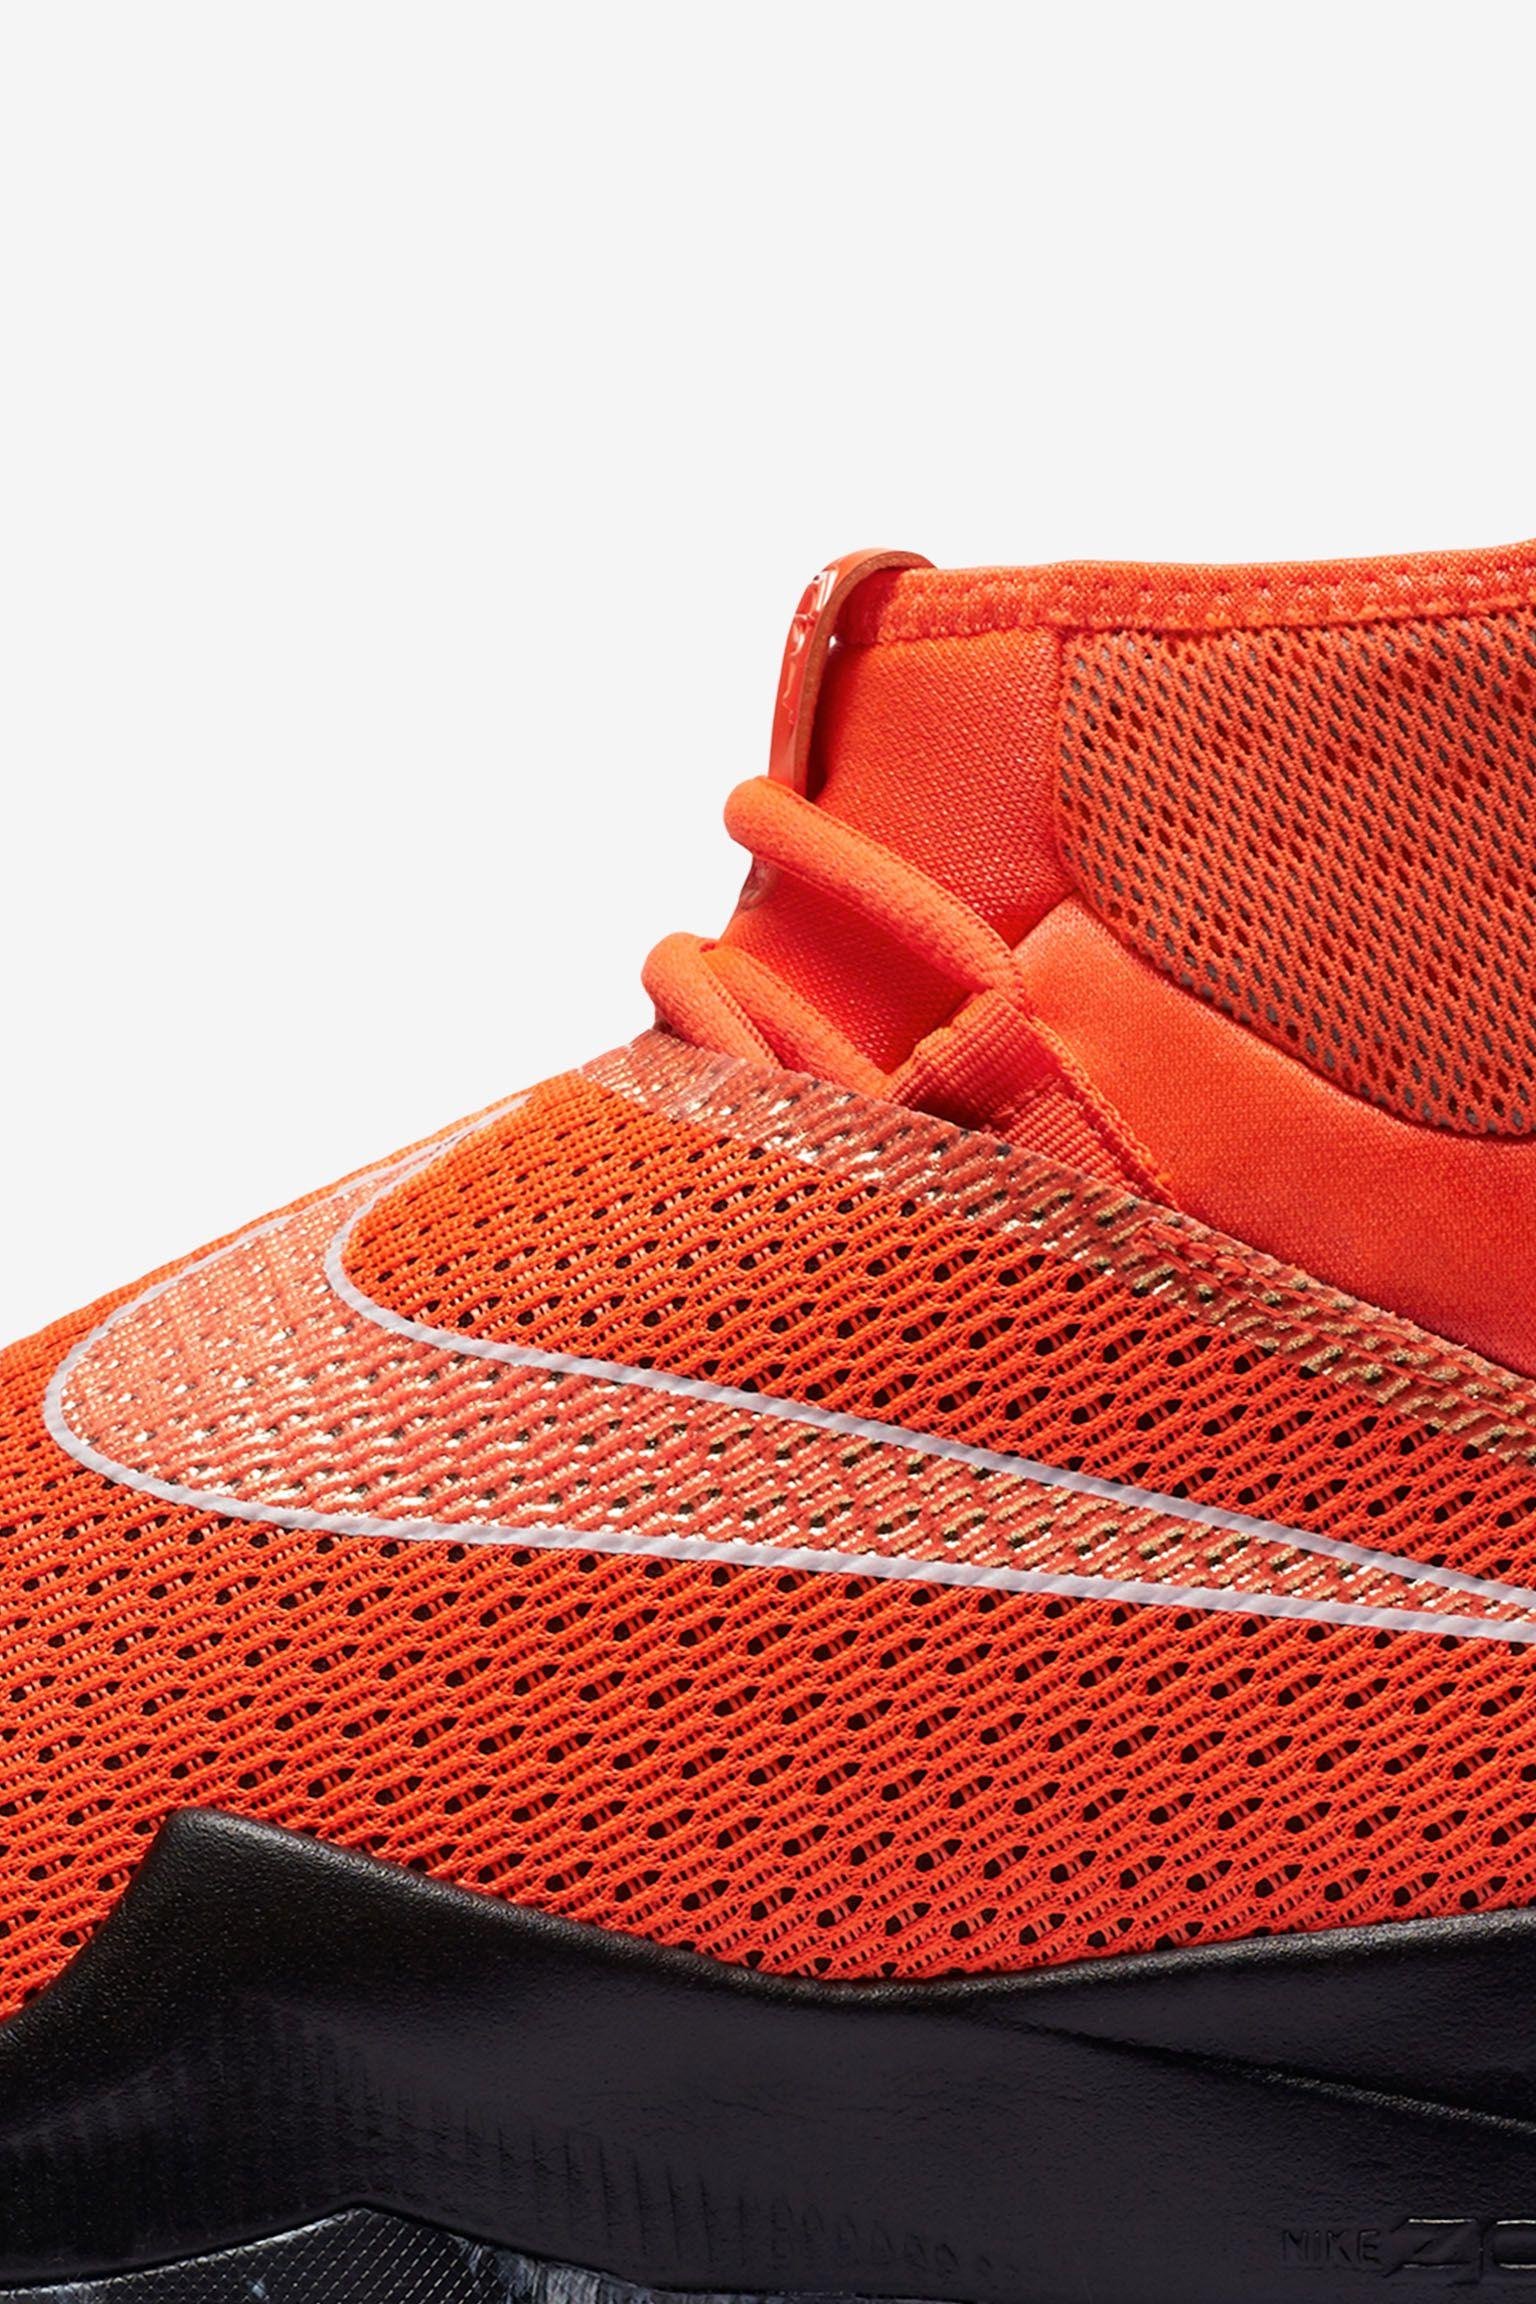 Nike Zoom HyperRev 2016 LMTD 'You Do You'